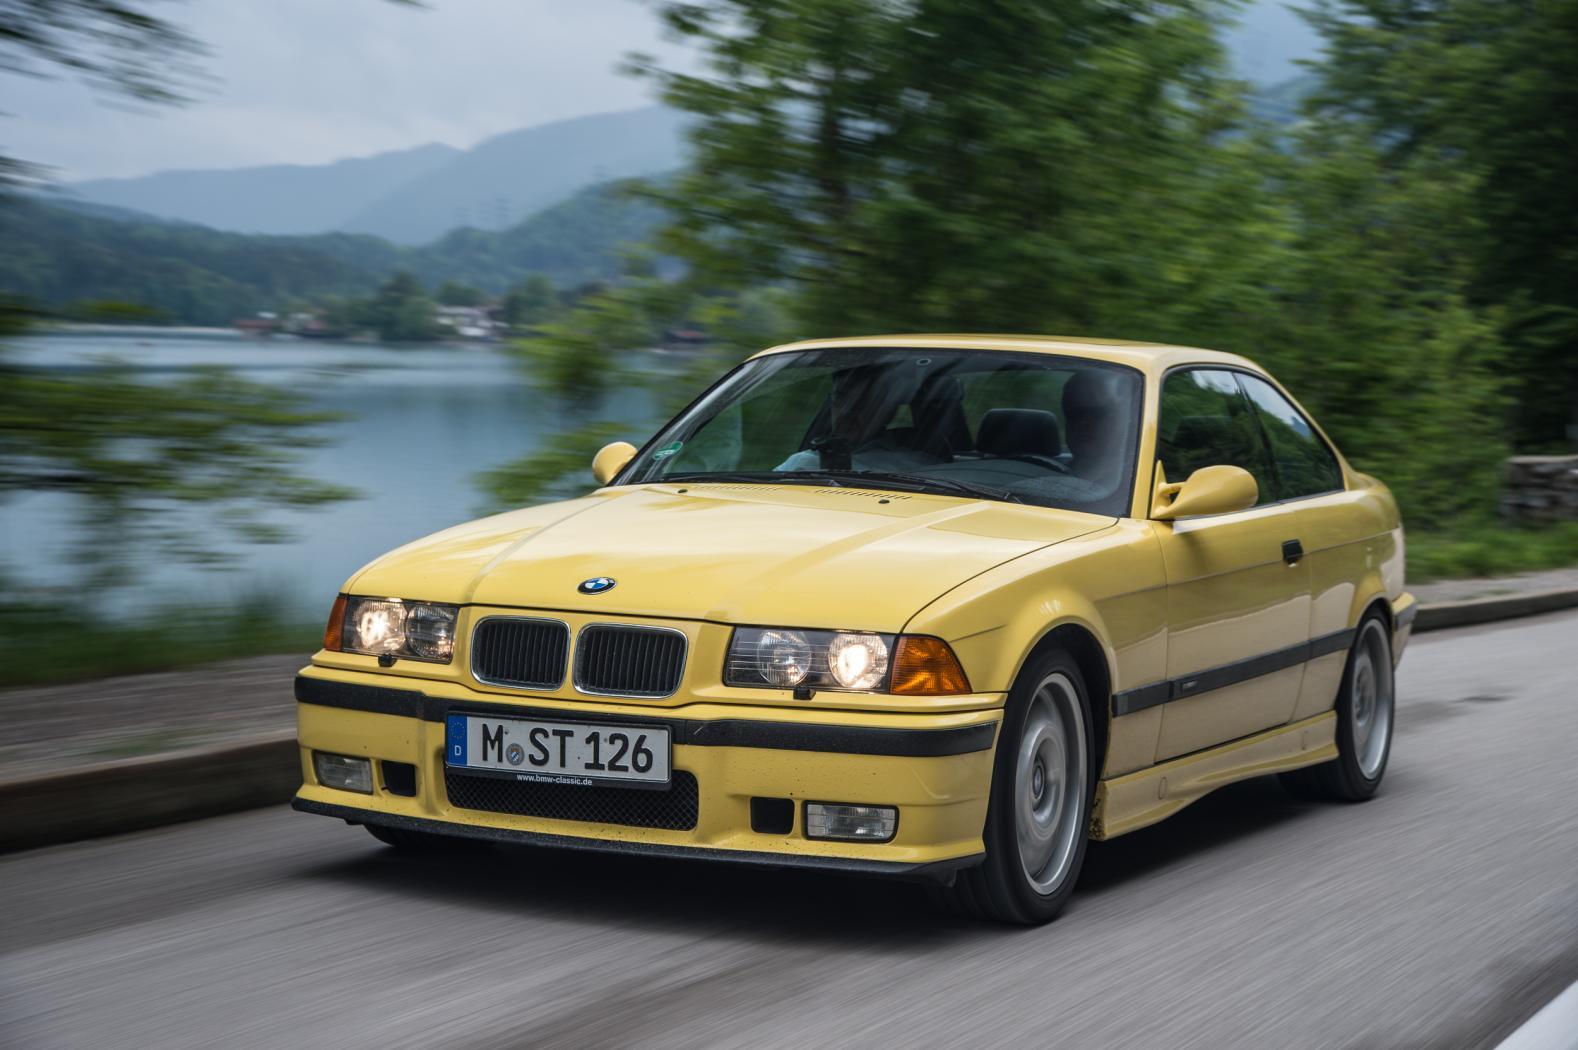 BMW-M3-E36_20170410-2213.jpeg